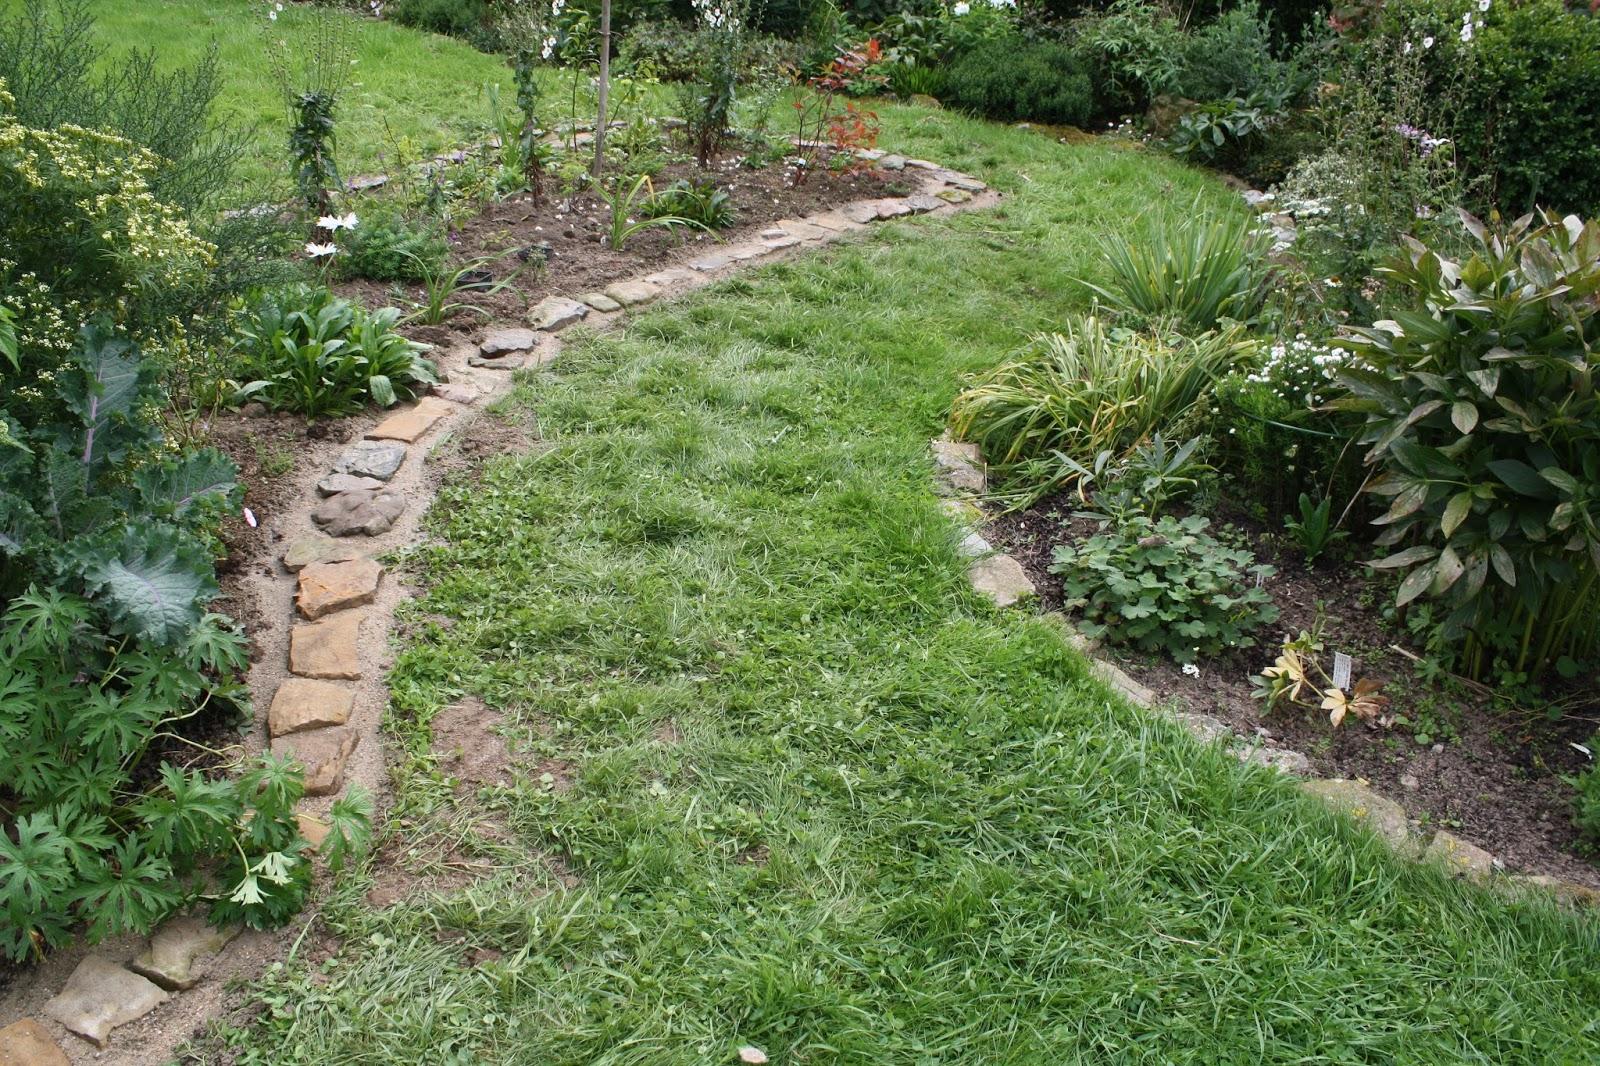 Jardin À Welekete: Bordure En Moellon dedans Bordure Jardin Pas Cher